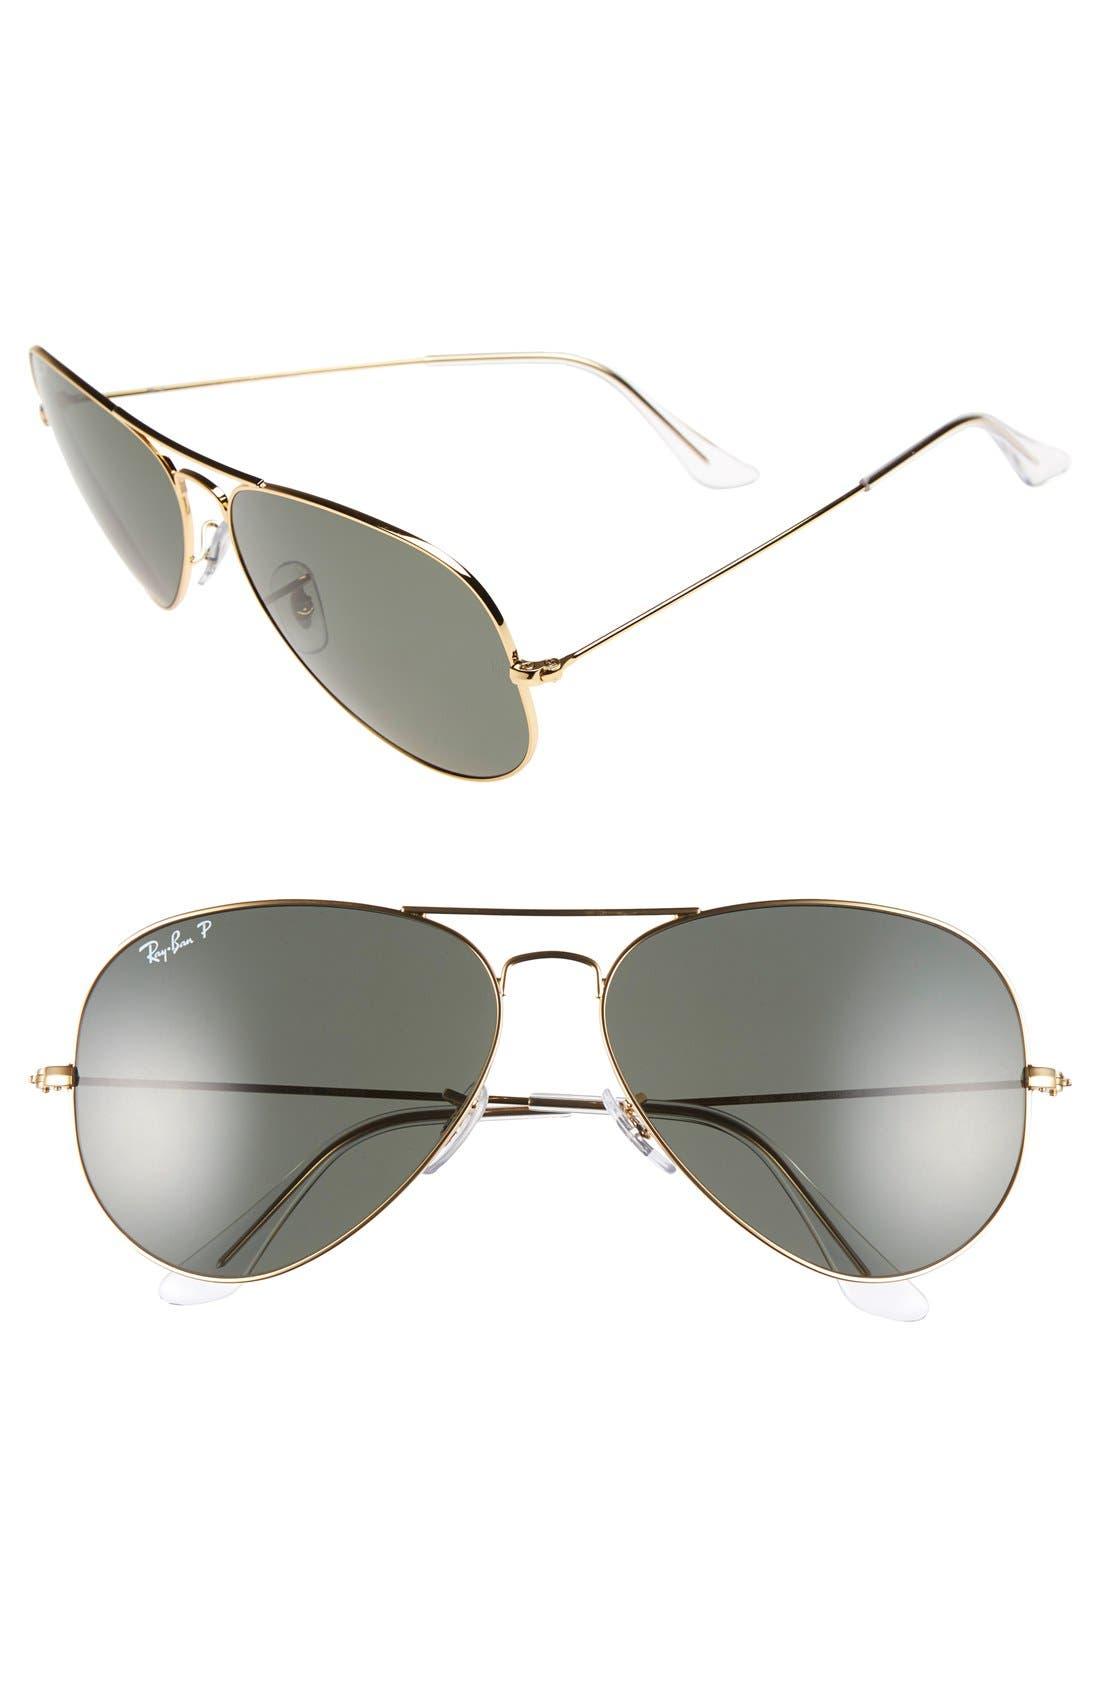 RAY-BAN 'Aviator' Polarized 62mm Sunglasses, Main, color, GOLD